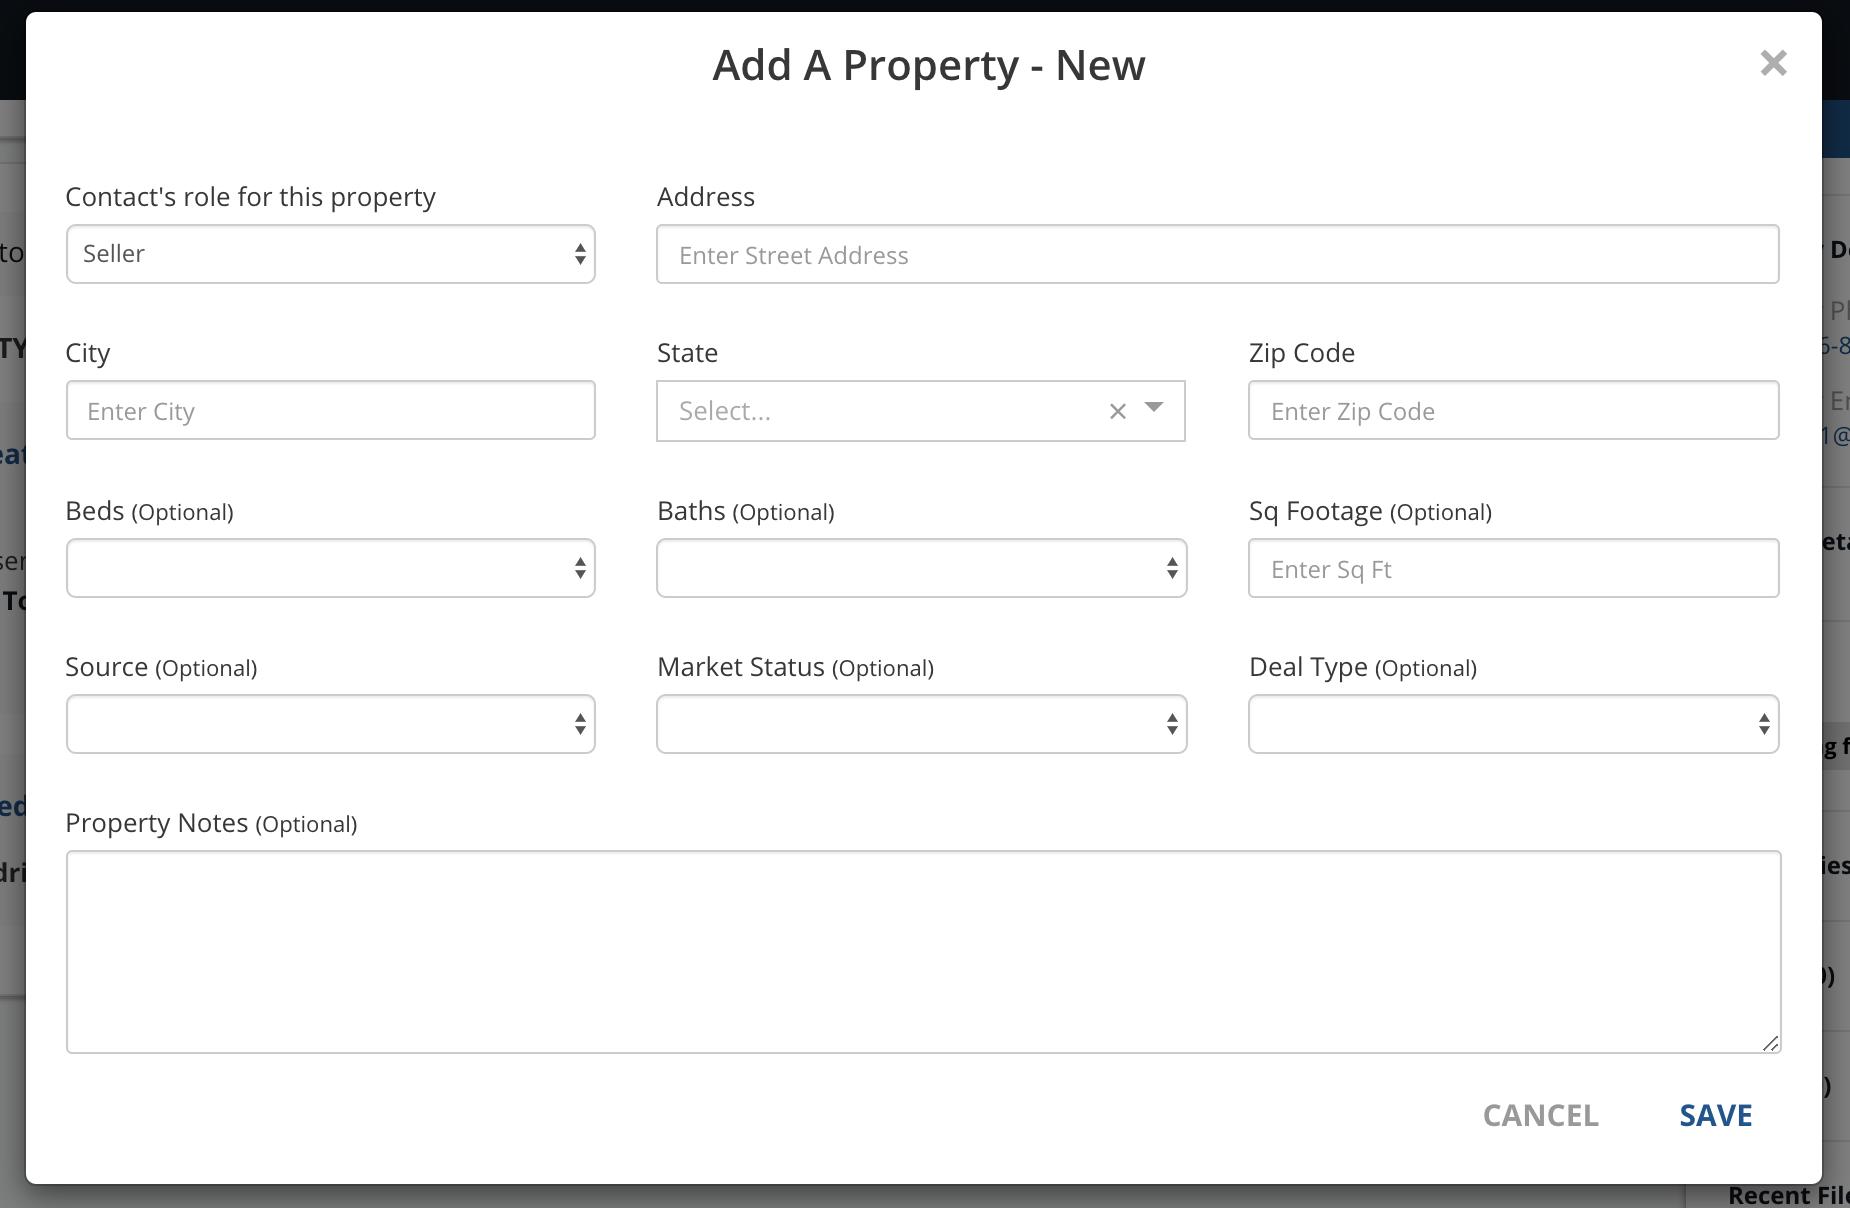 Add A Property New